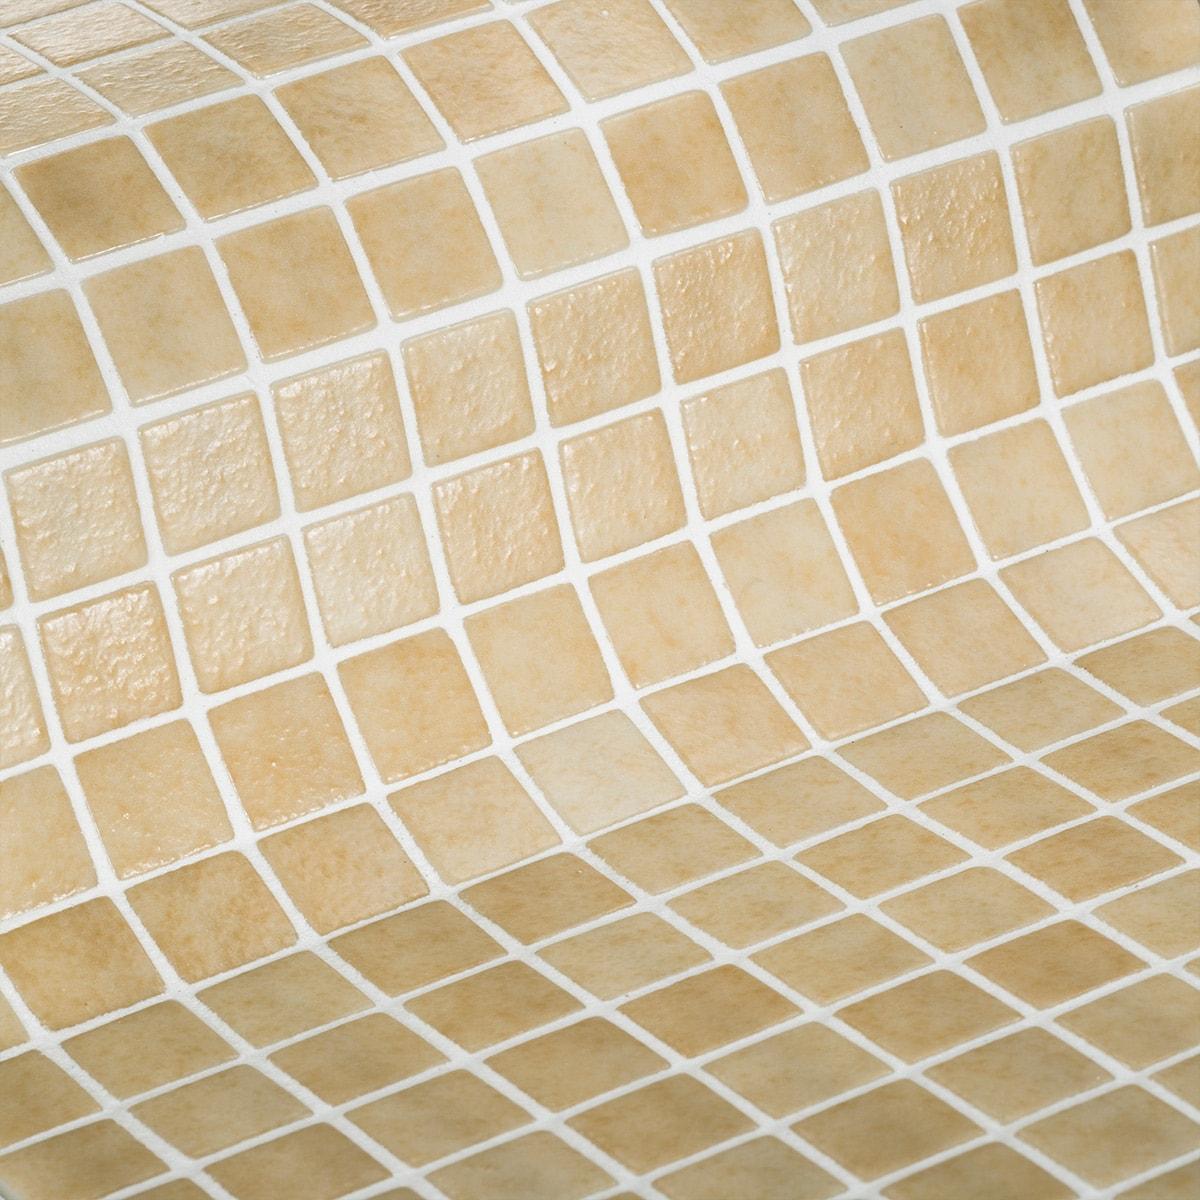 2596-B-Safe-Safe-steps-Mosaic-Ezarri.jpg